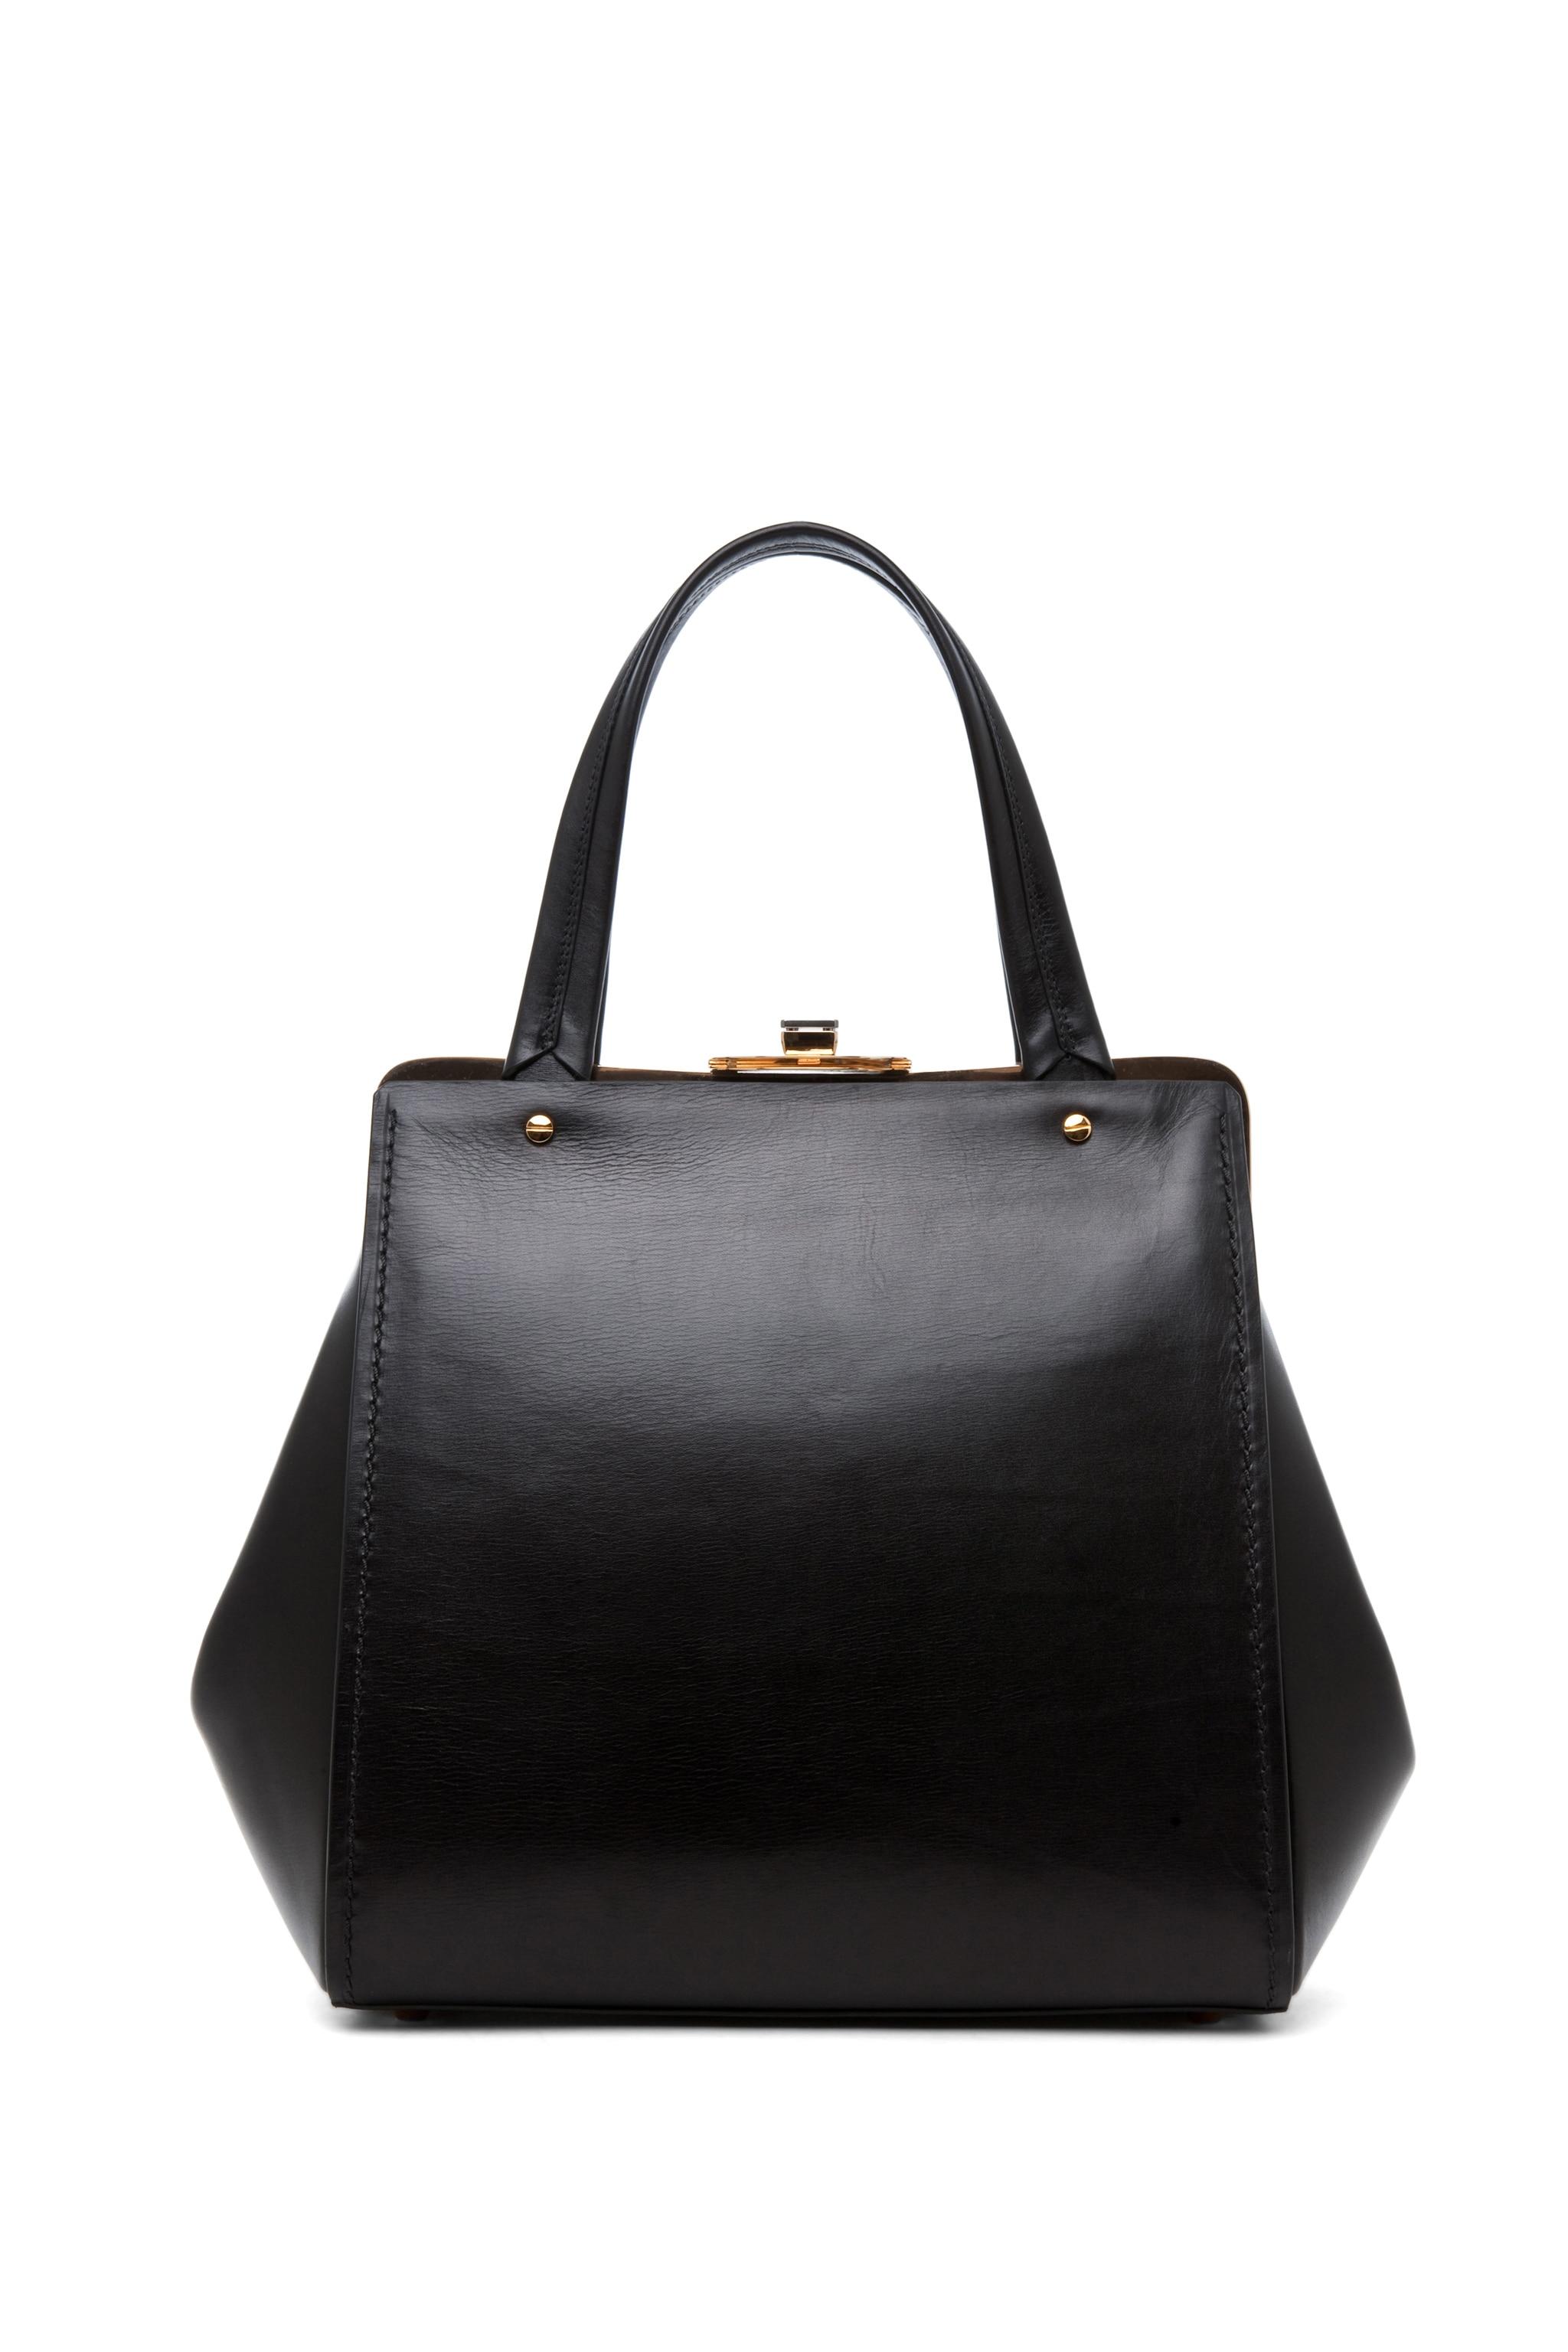 Image 2 of Lanvin Doctor Bag in Black